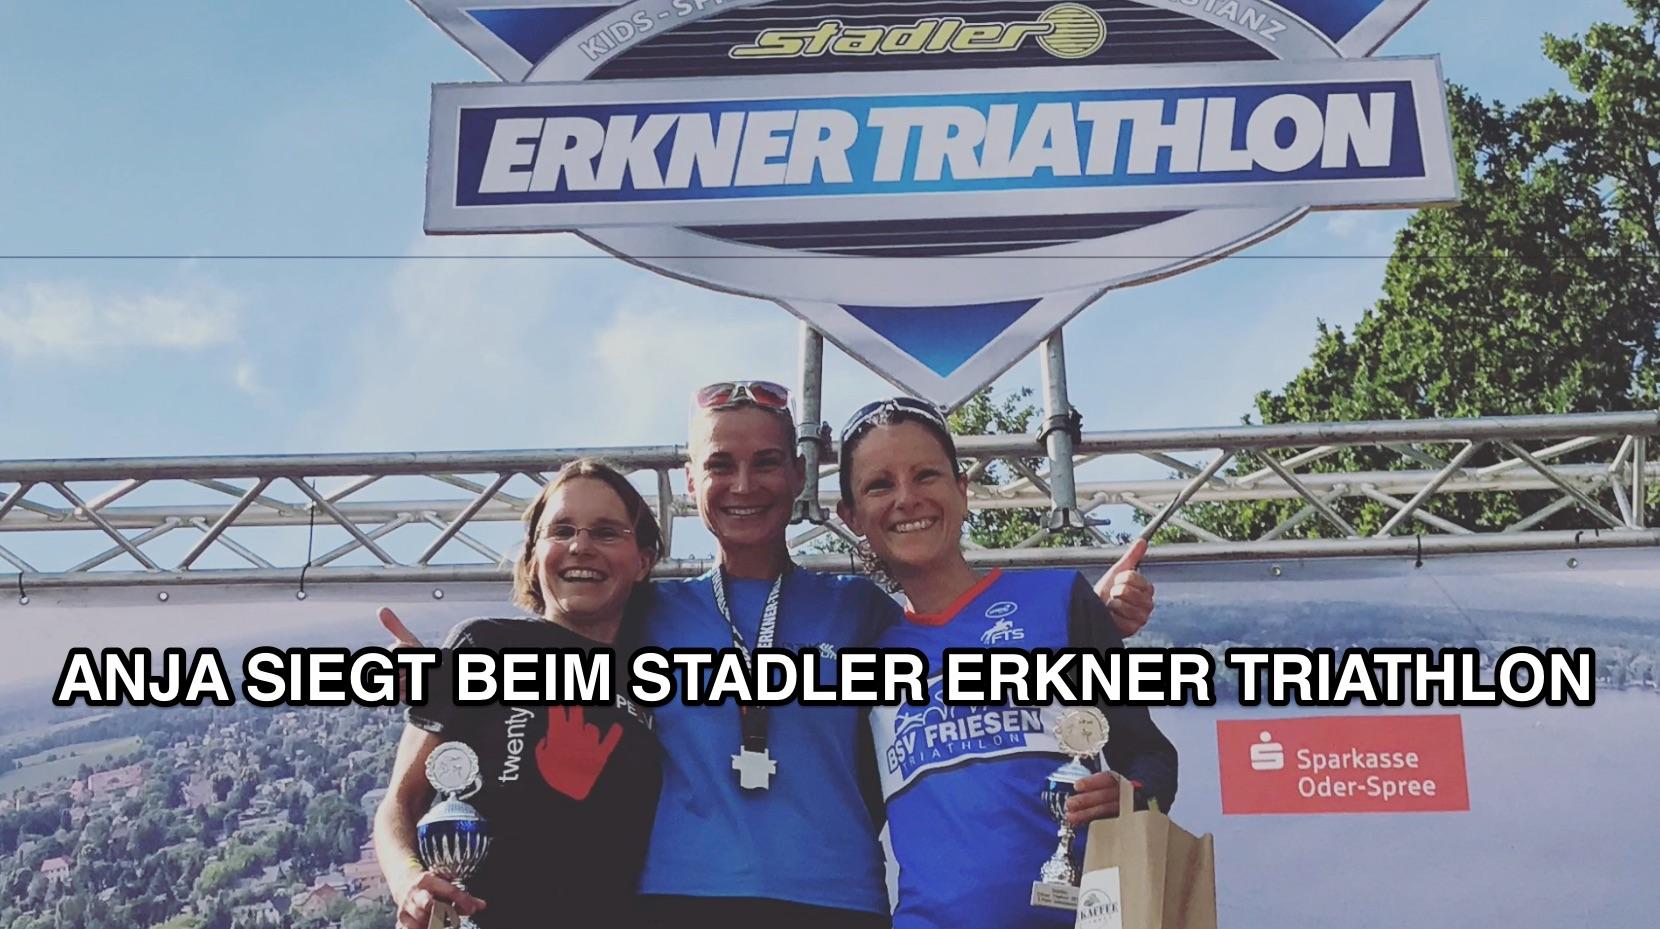 Anja siegt beim Stadler Erkner Triathlon